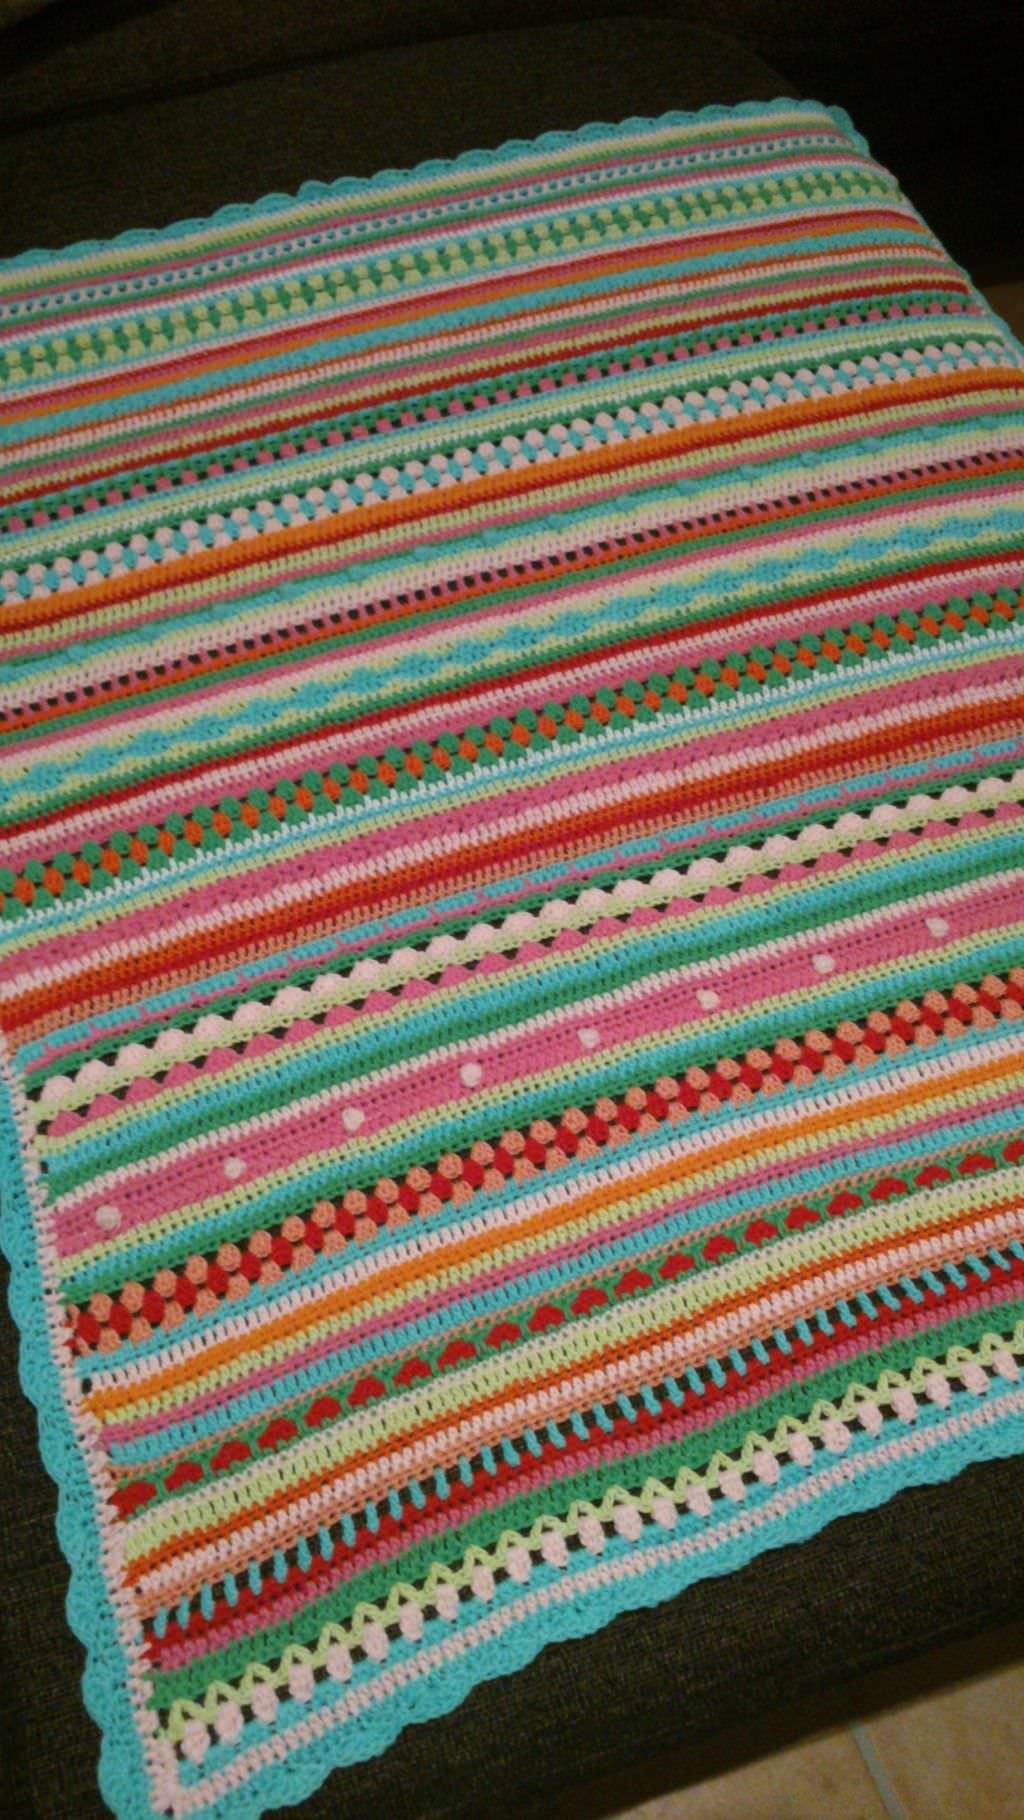 http://schoenstricken.de/wp-content/uploads/2013/12/crochet-along-babydecke-von-lucia-schoenstricken.de_.jpg